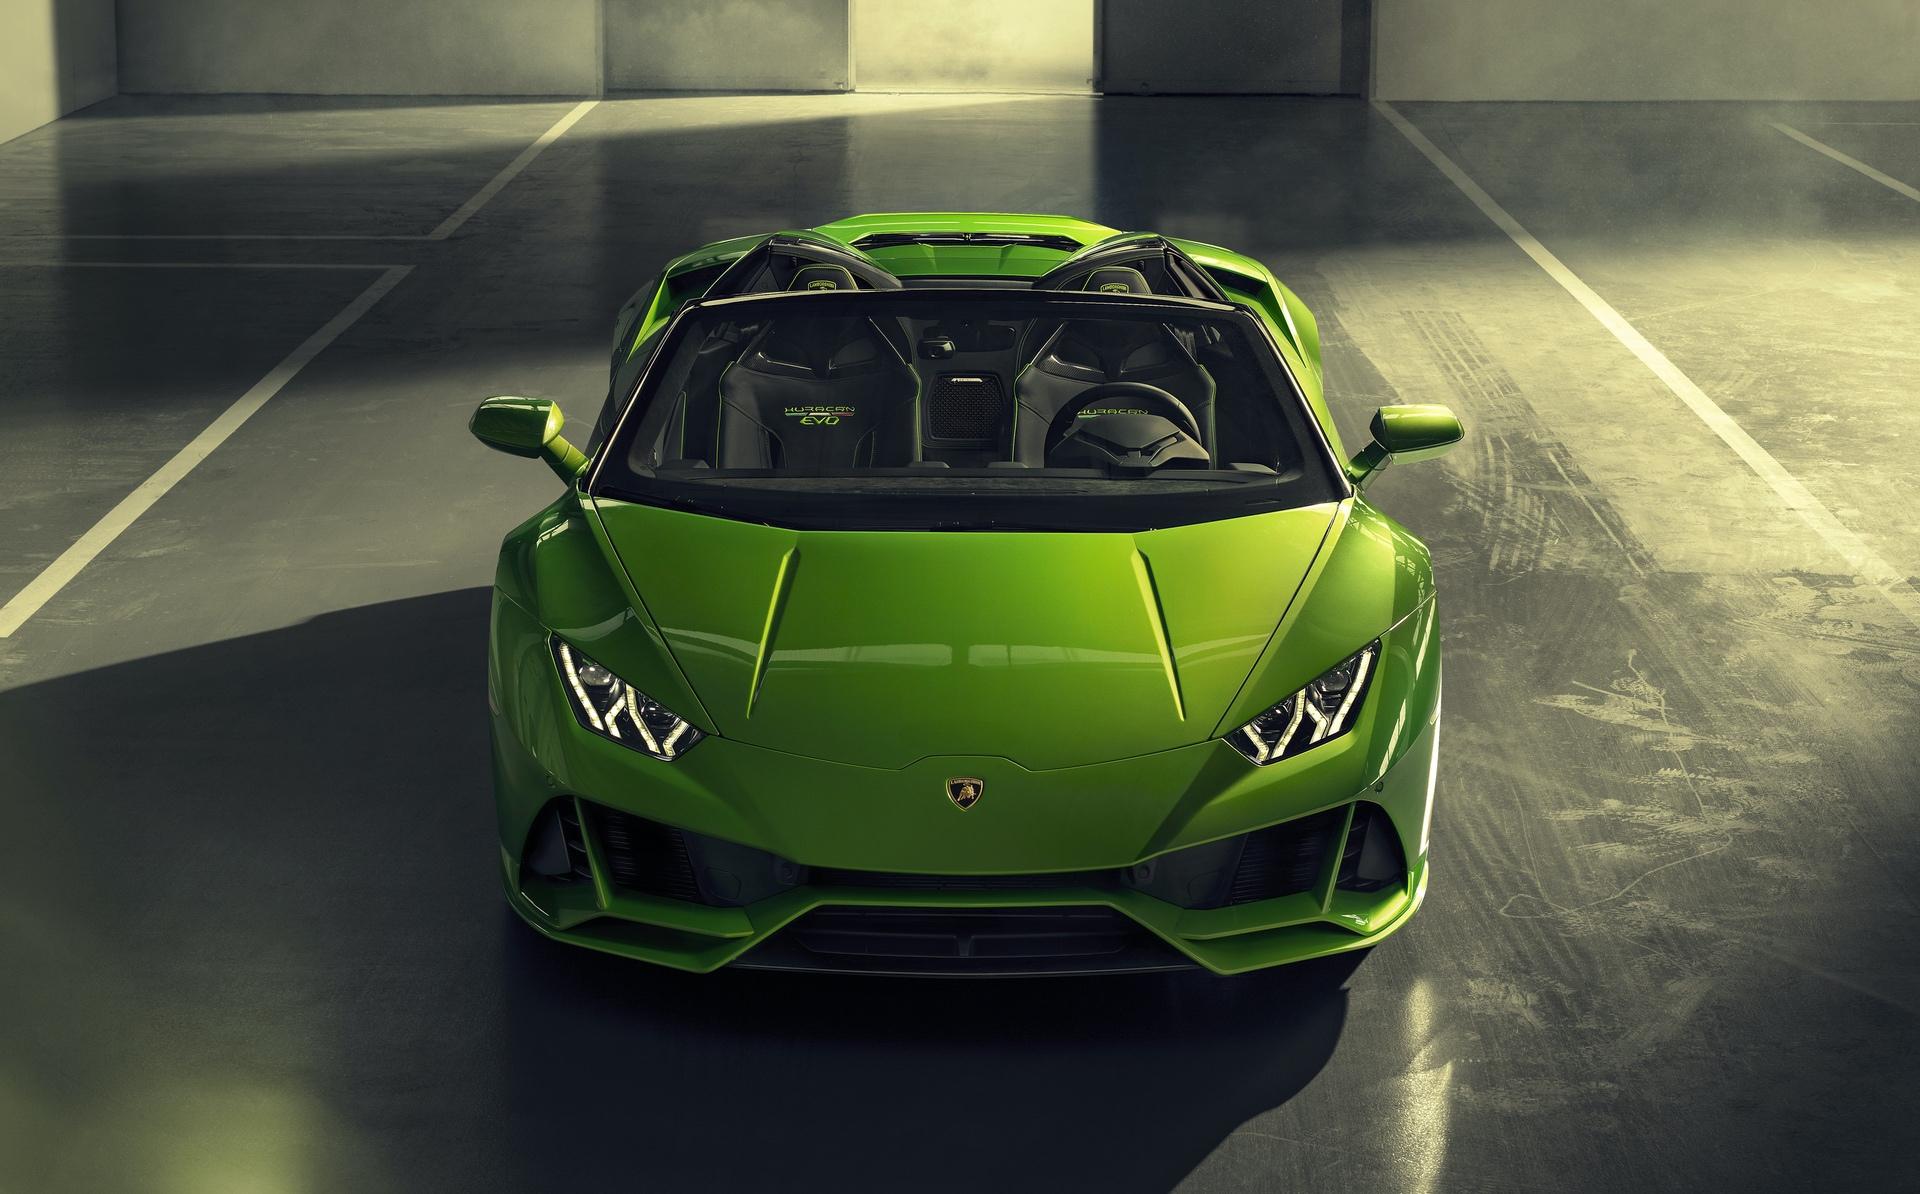 Lamborghini_Huracan_Evo_Spyder_0001